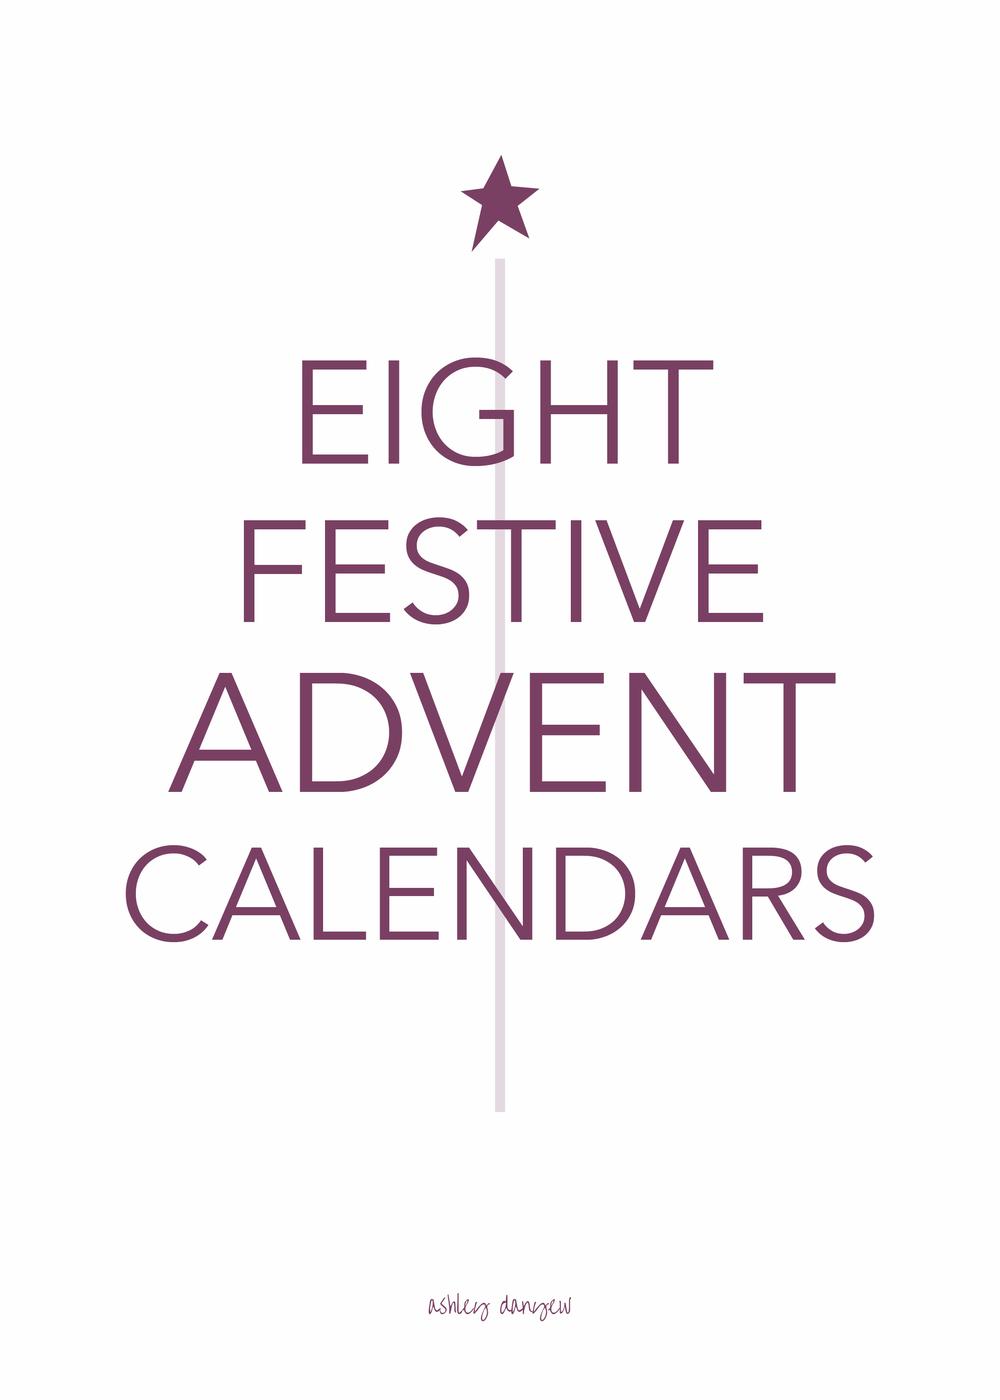 Copy of 8 Festive Advent Calendars